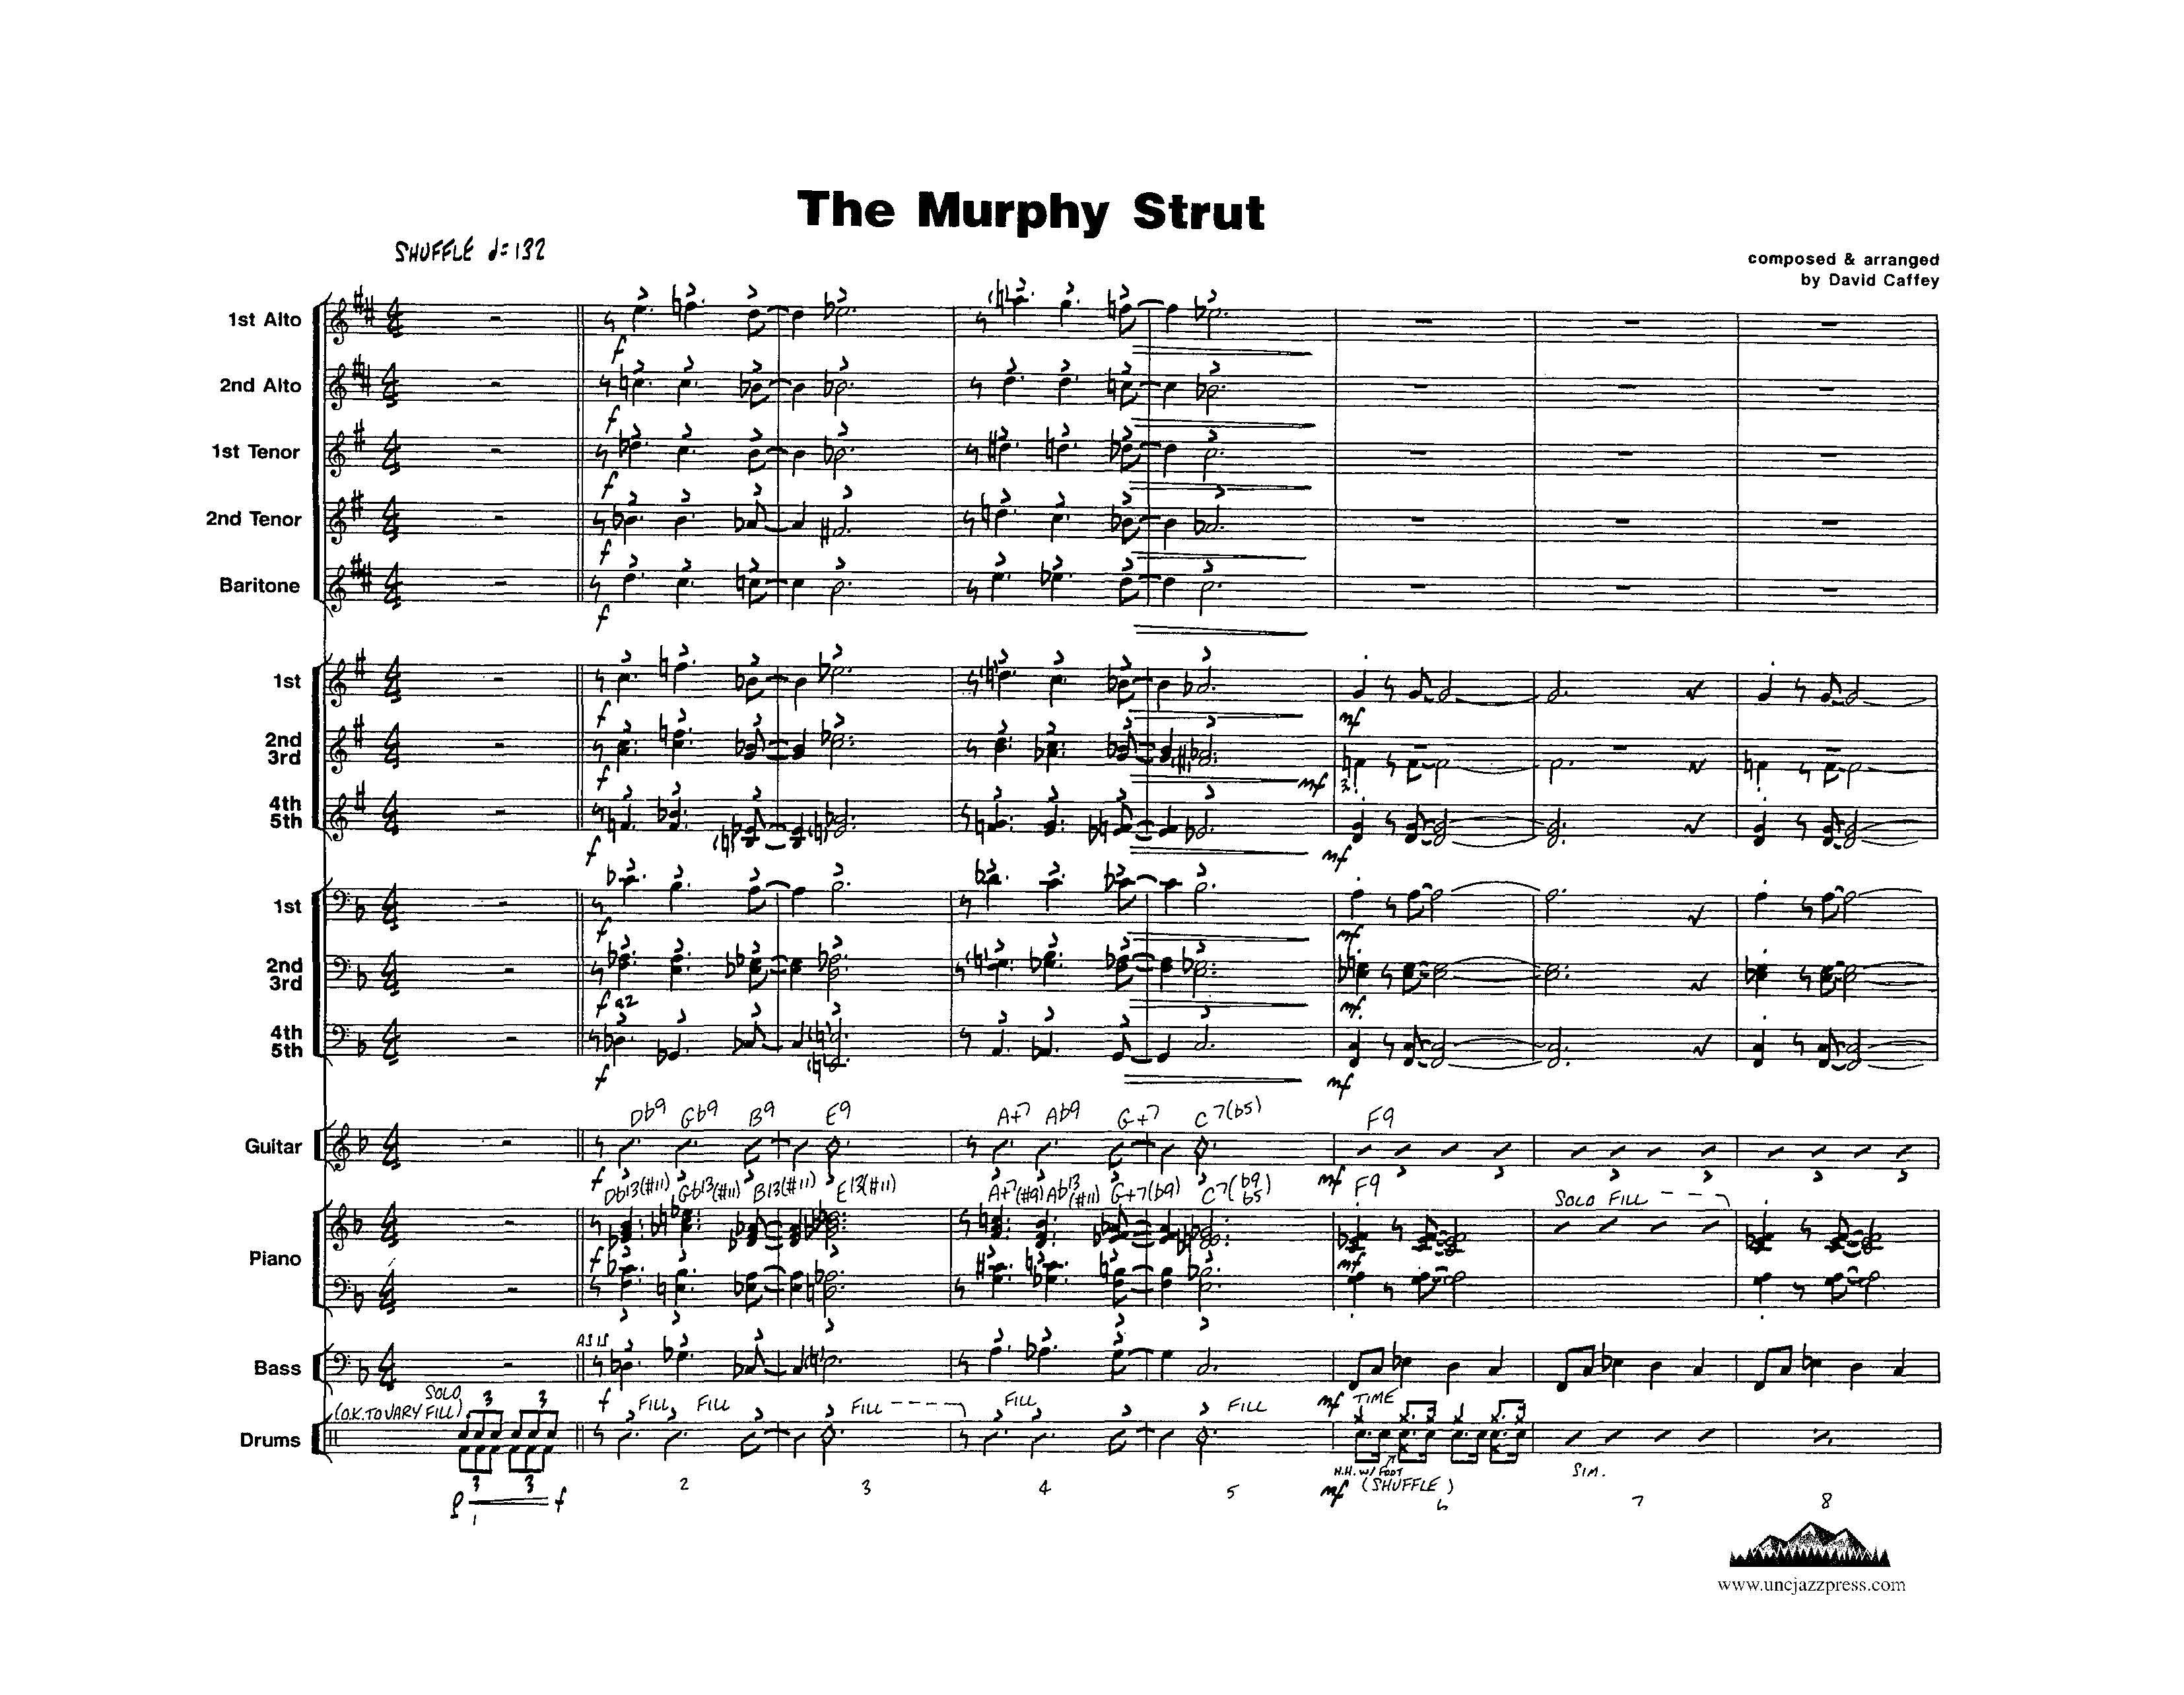 Download Free Count Basie Big Band Score Pdf - advertisingkindl